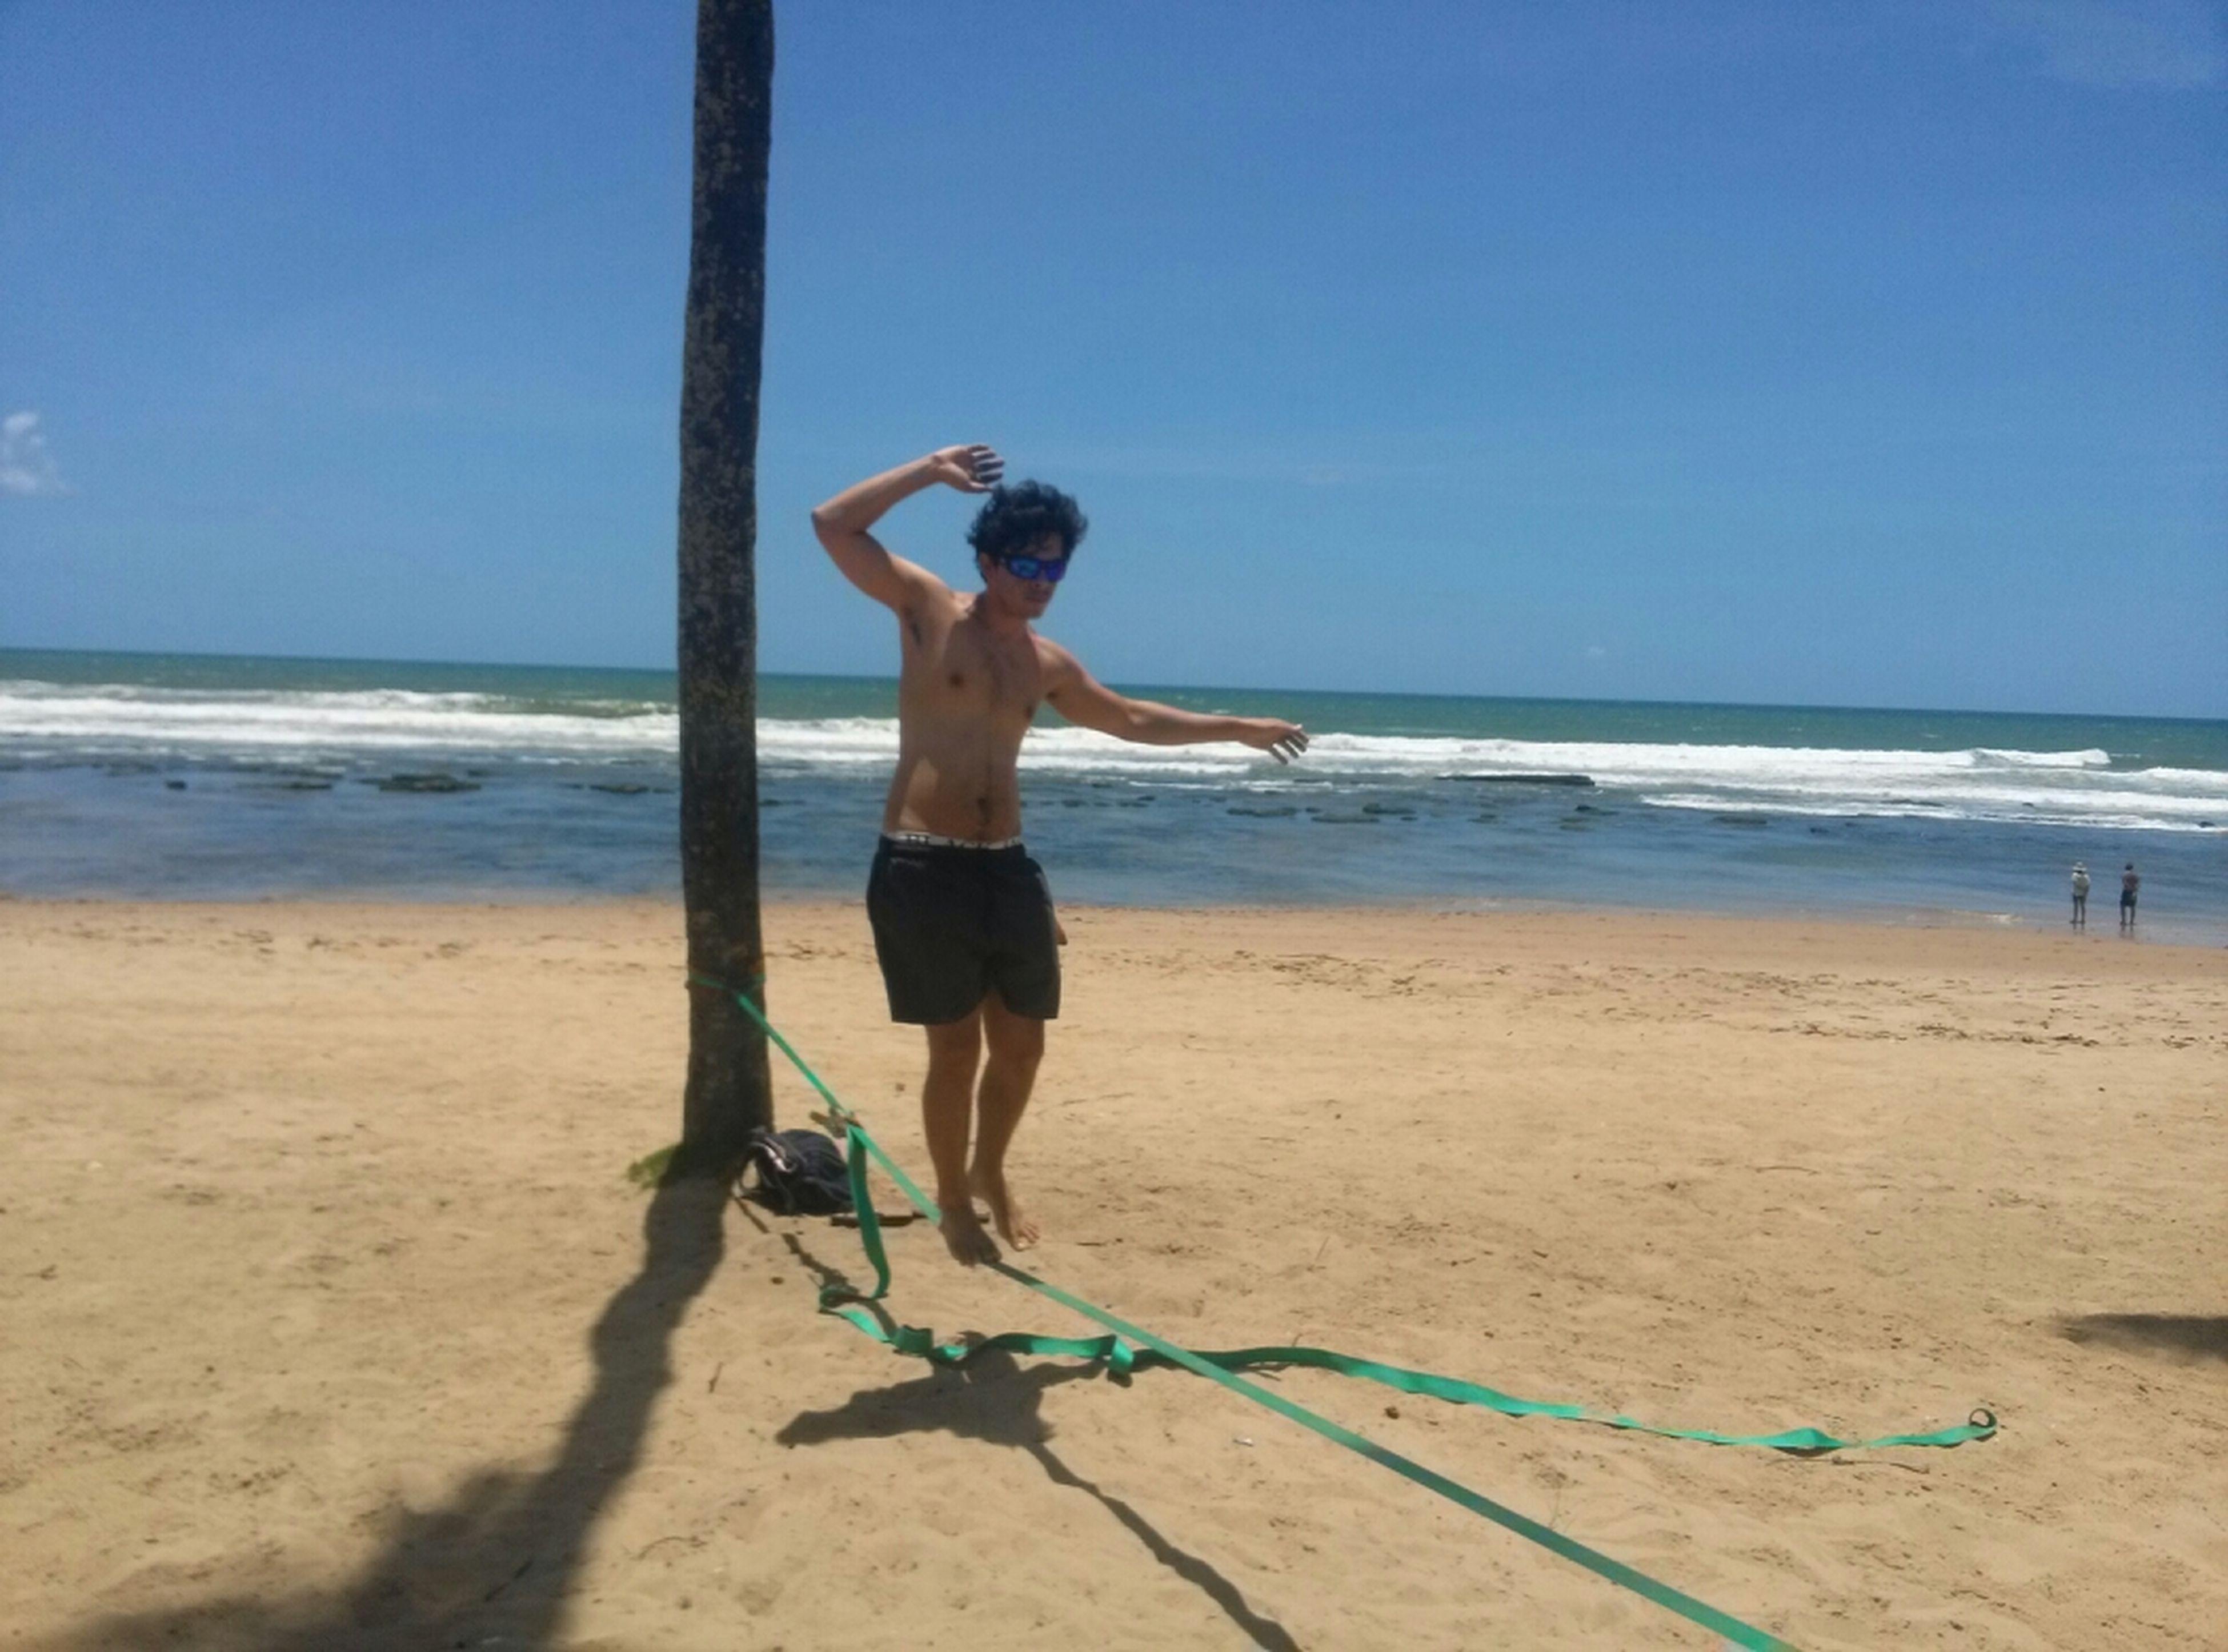 Slackline Life Is A Beach Enjoying Life